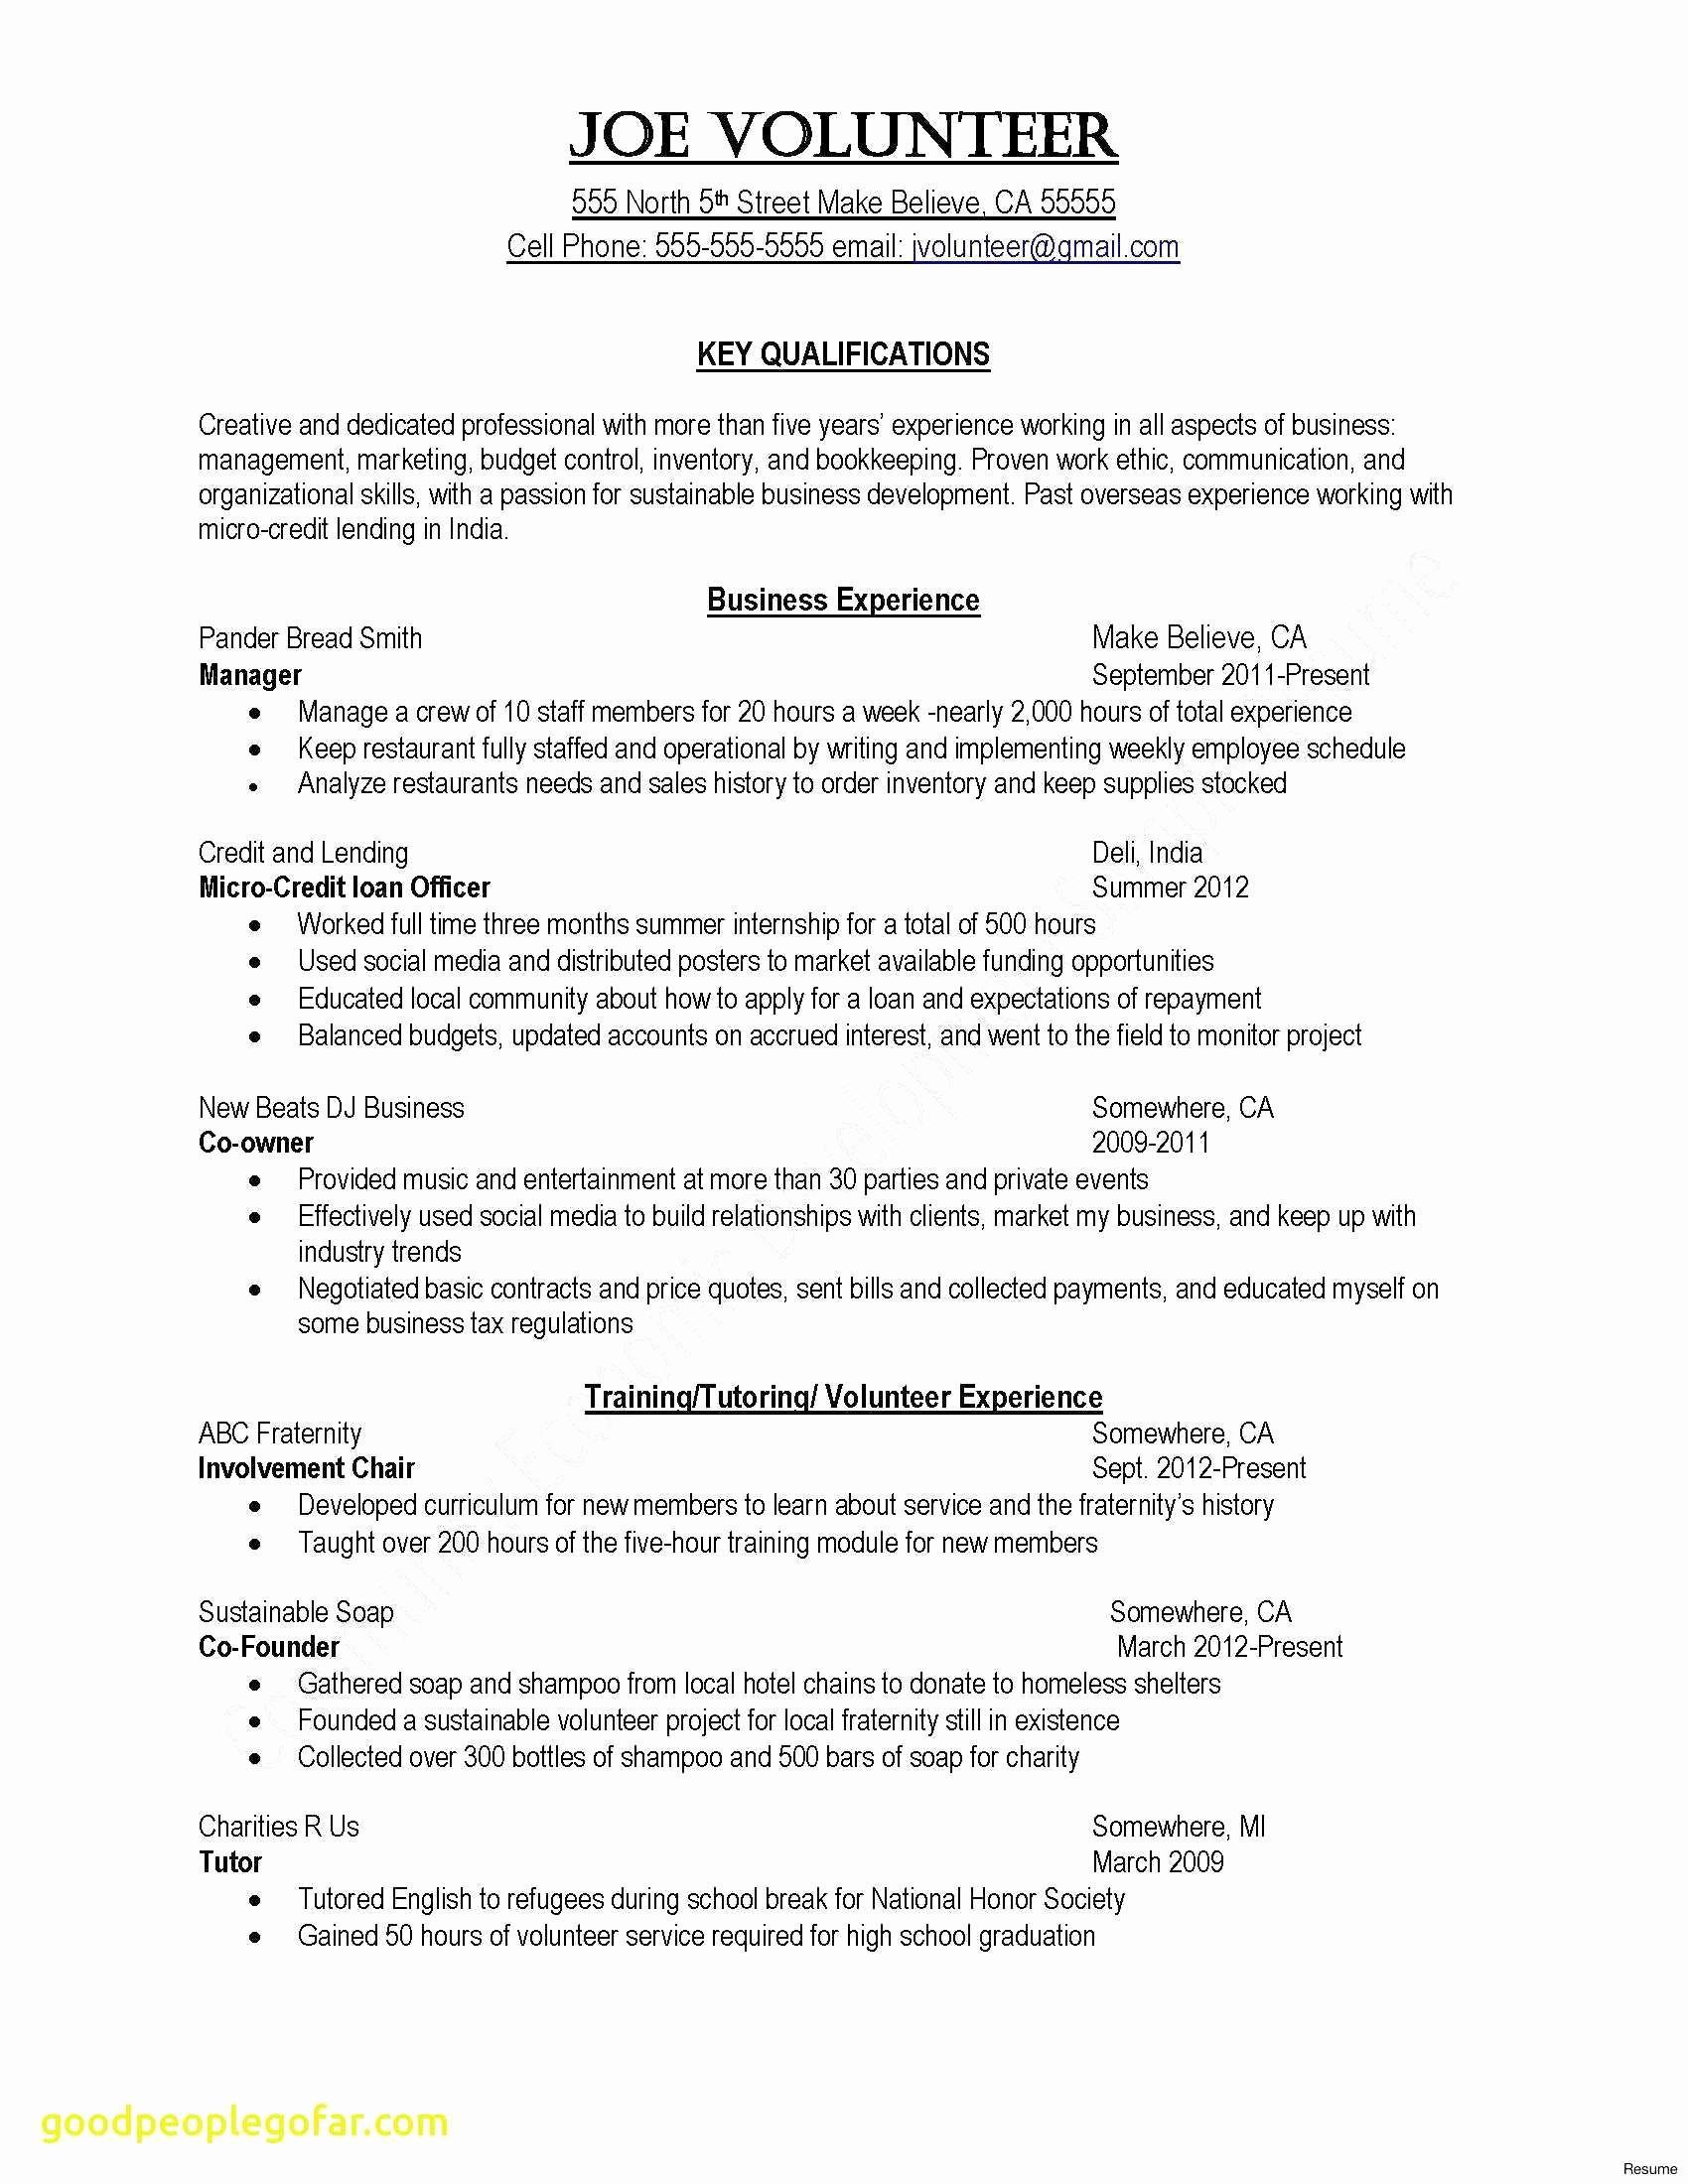 Basic Resume Cover Letter Template - Resume Cover Letter Template Beautiful Elegant Sample College